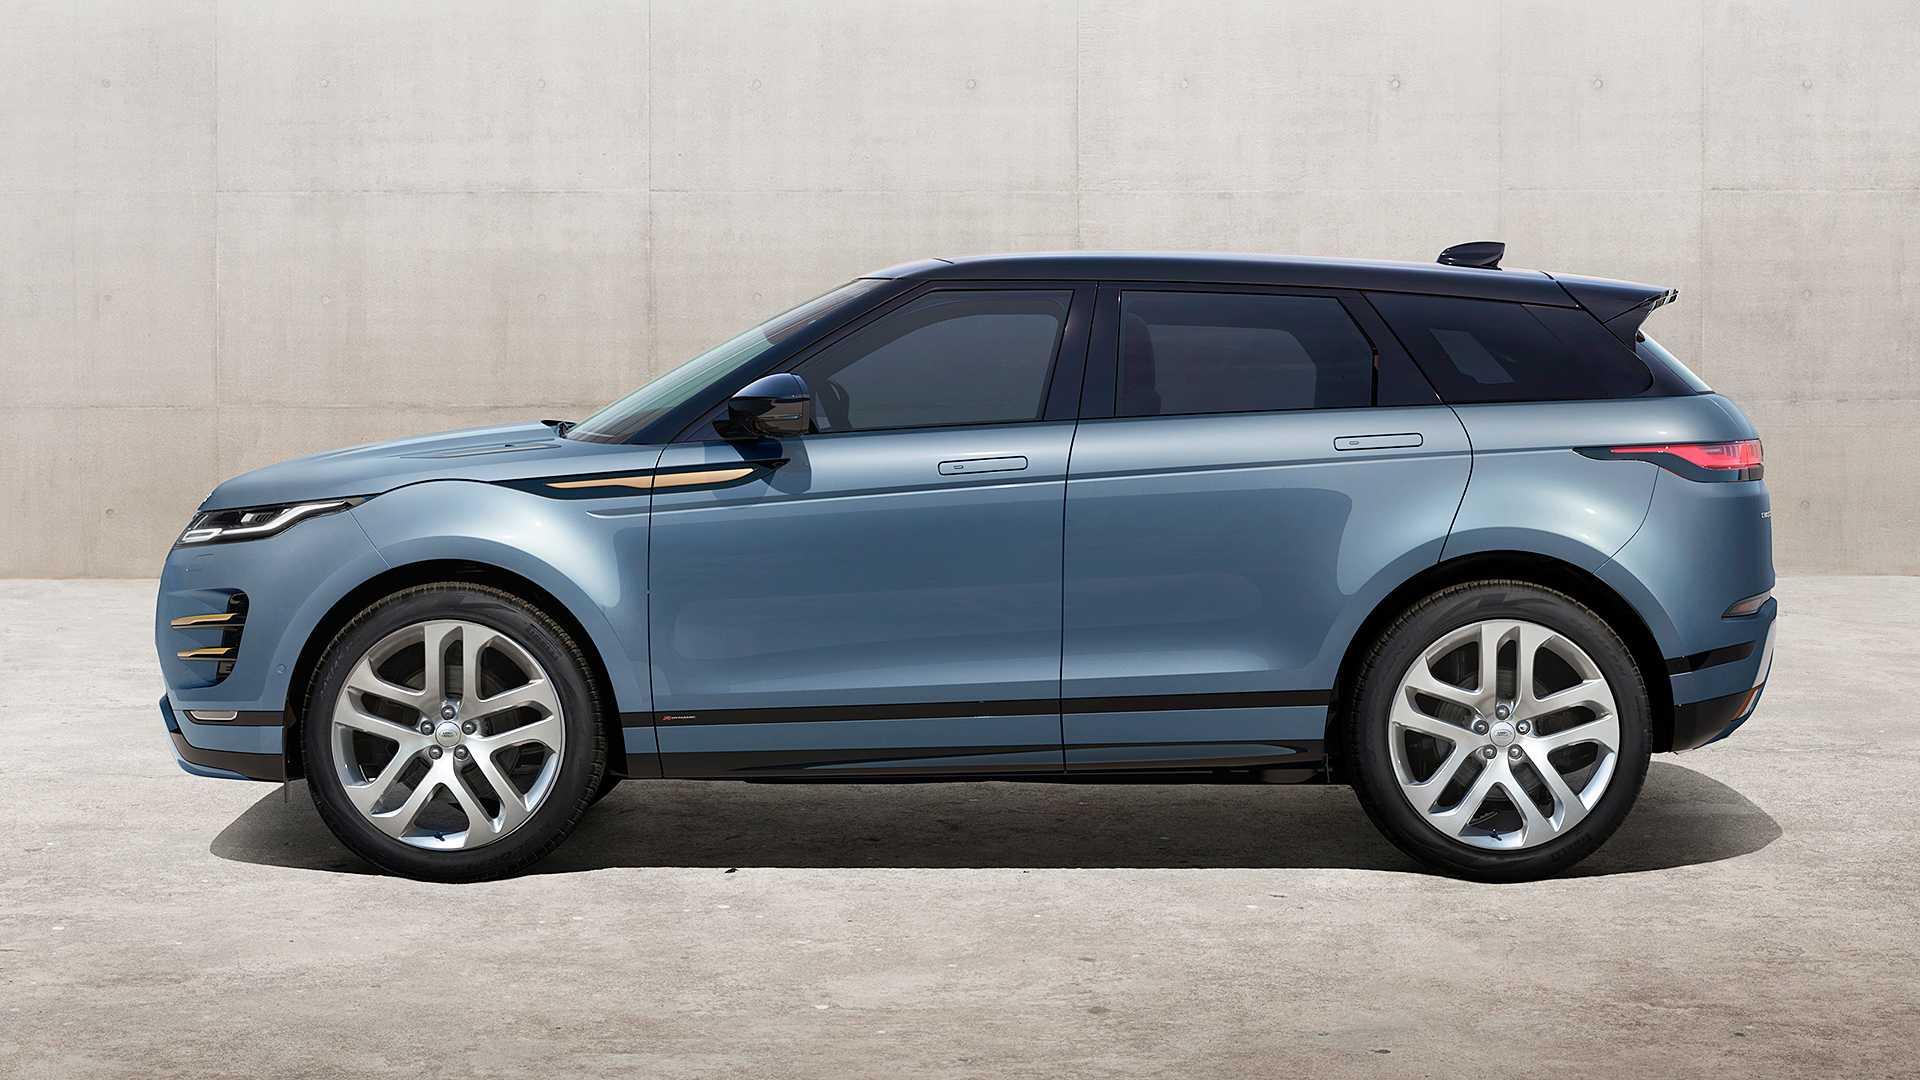 2020-range-rover-evoque (77)